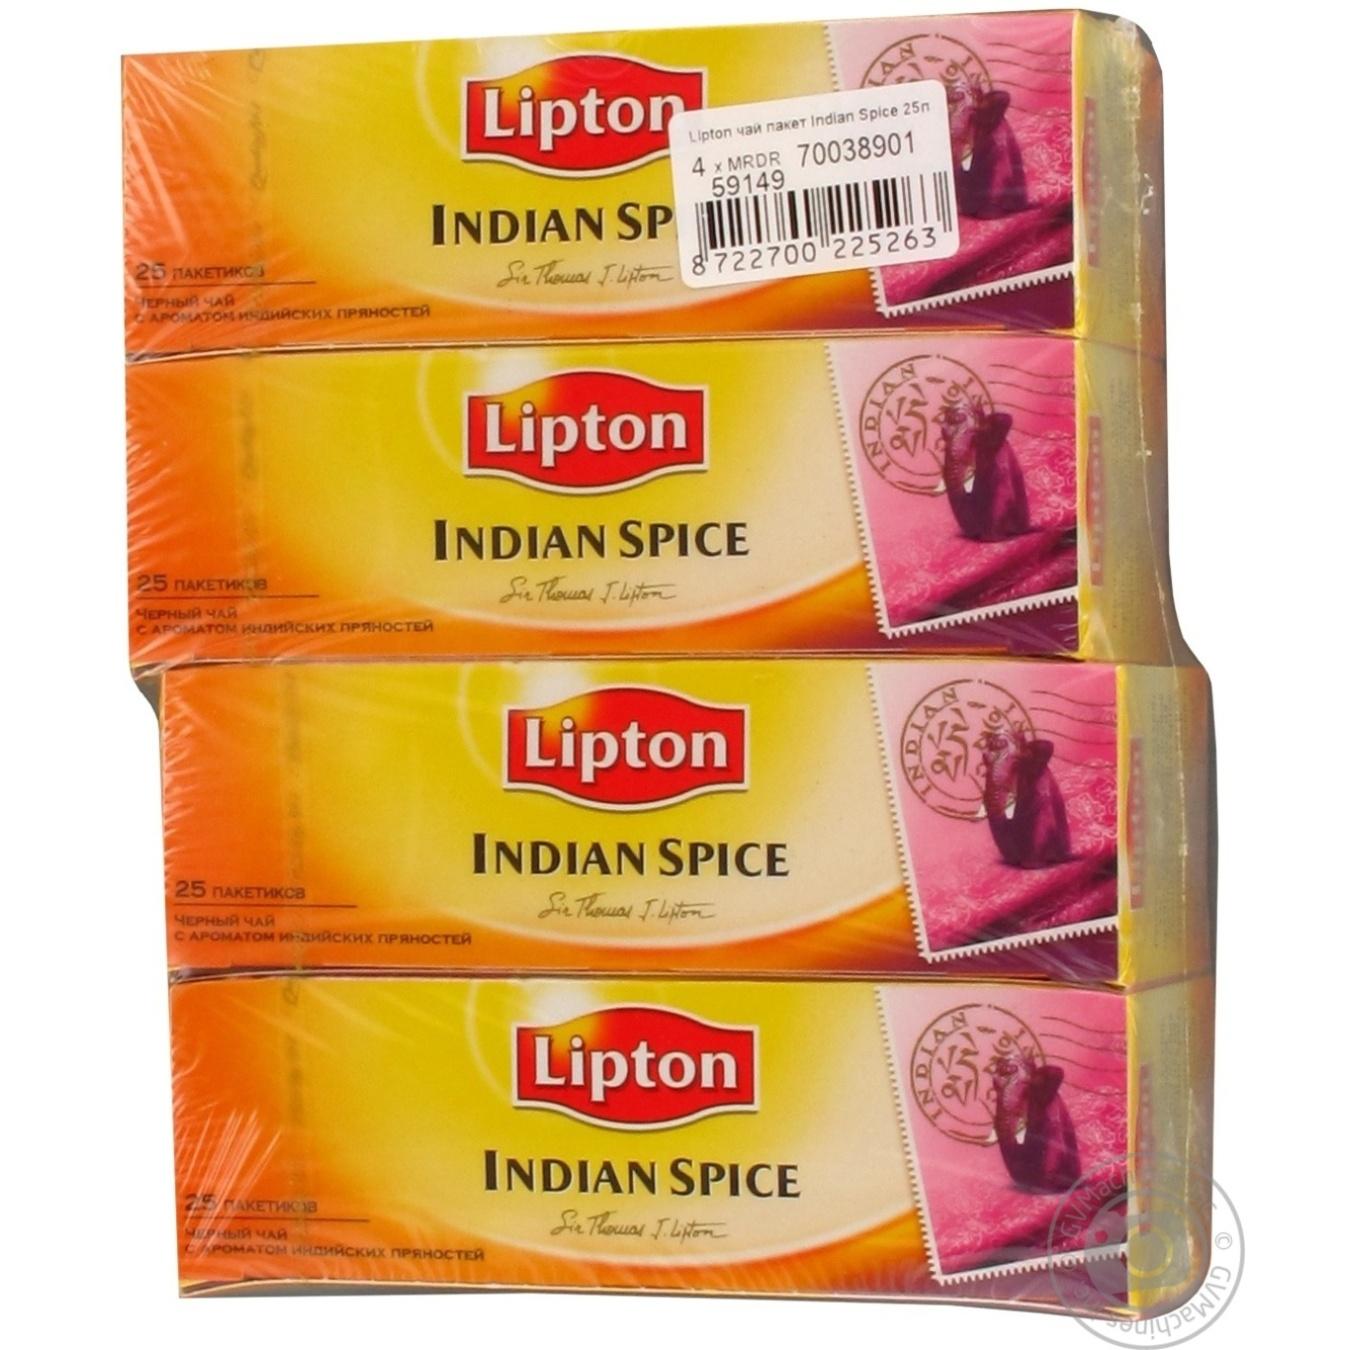 Tea Lipton Indian Spice Black Packed 25pcs Russia Drinks Tea Black Tea Zakaz Ua Official Online Grocery For Supermarkets In Ukraine Buy Tea Lipton Indian Spice Black Packed 25pcs Russia Delivery